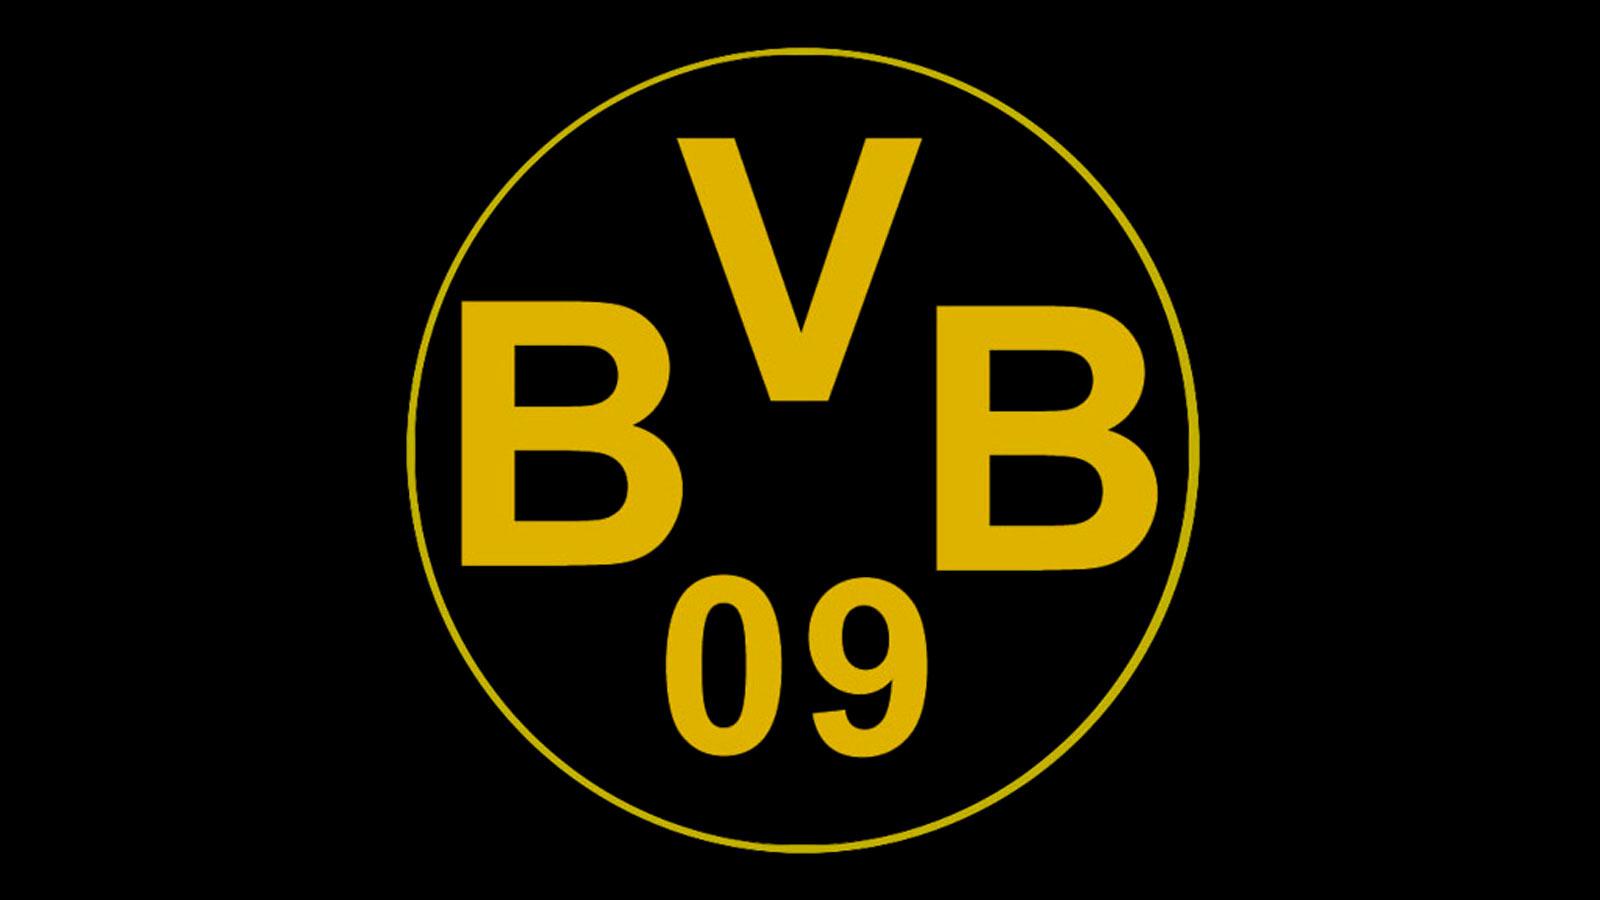 Borussia Dortmund 2012 Wallpapers Hd